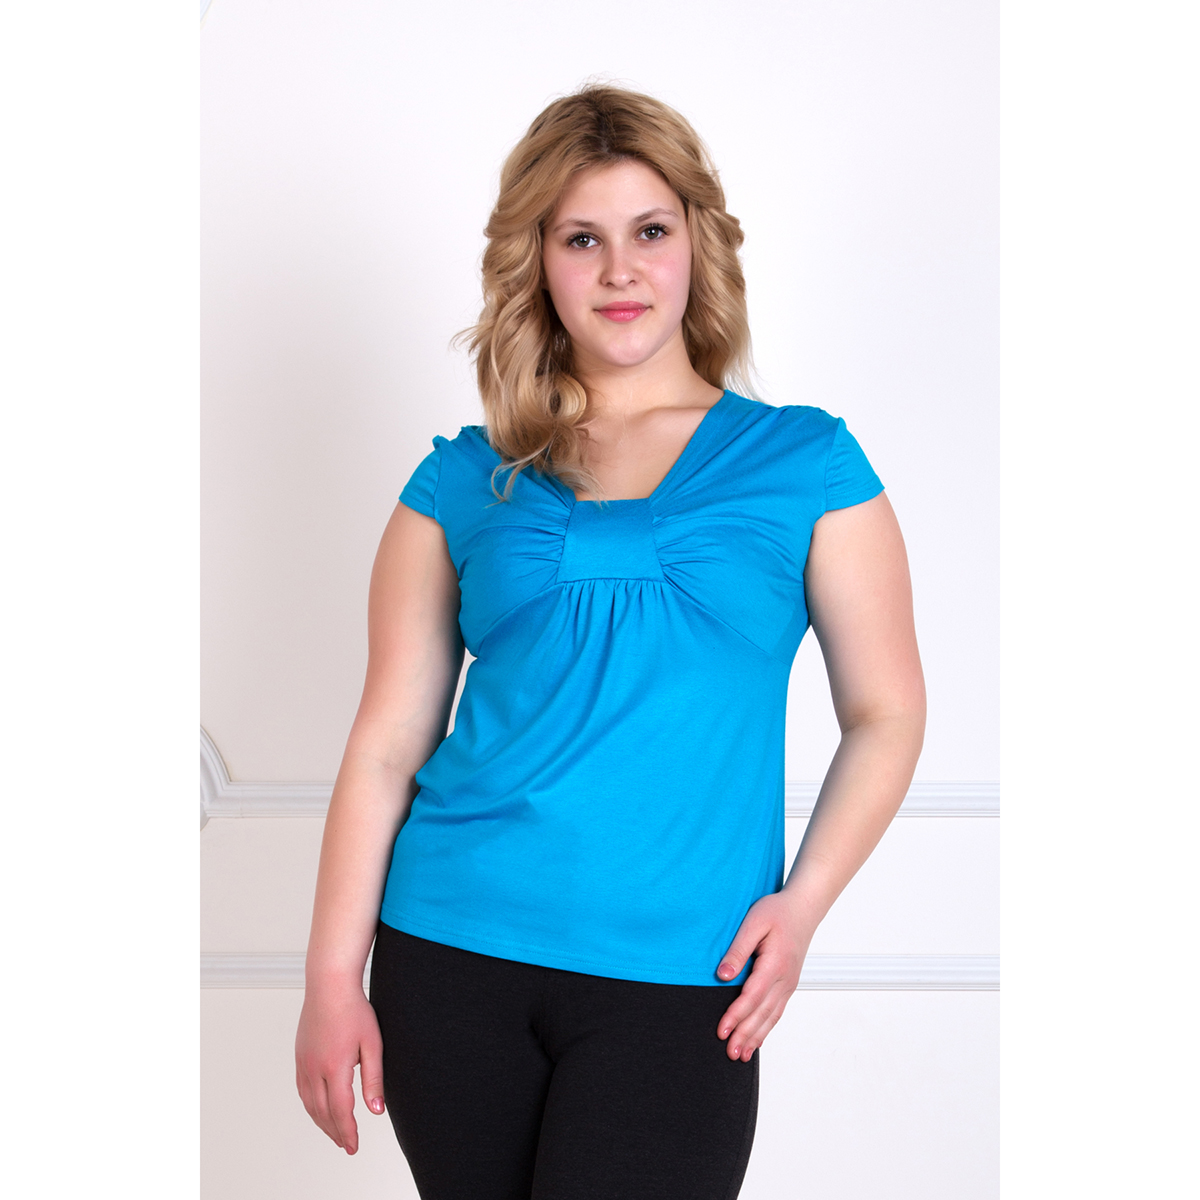 Женская блуза Романтика Голубой, размер 48Блузы<br>Обхват груди:96 см<br>Обхват талии:78 см<br>Обхват бедер:104 см<br>Рост:167 см<br><br>Тип: Жен. блуза<br>Размер: 48<br>Материал: Вискоза